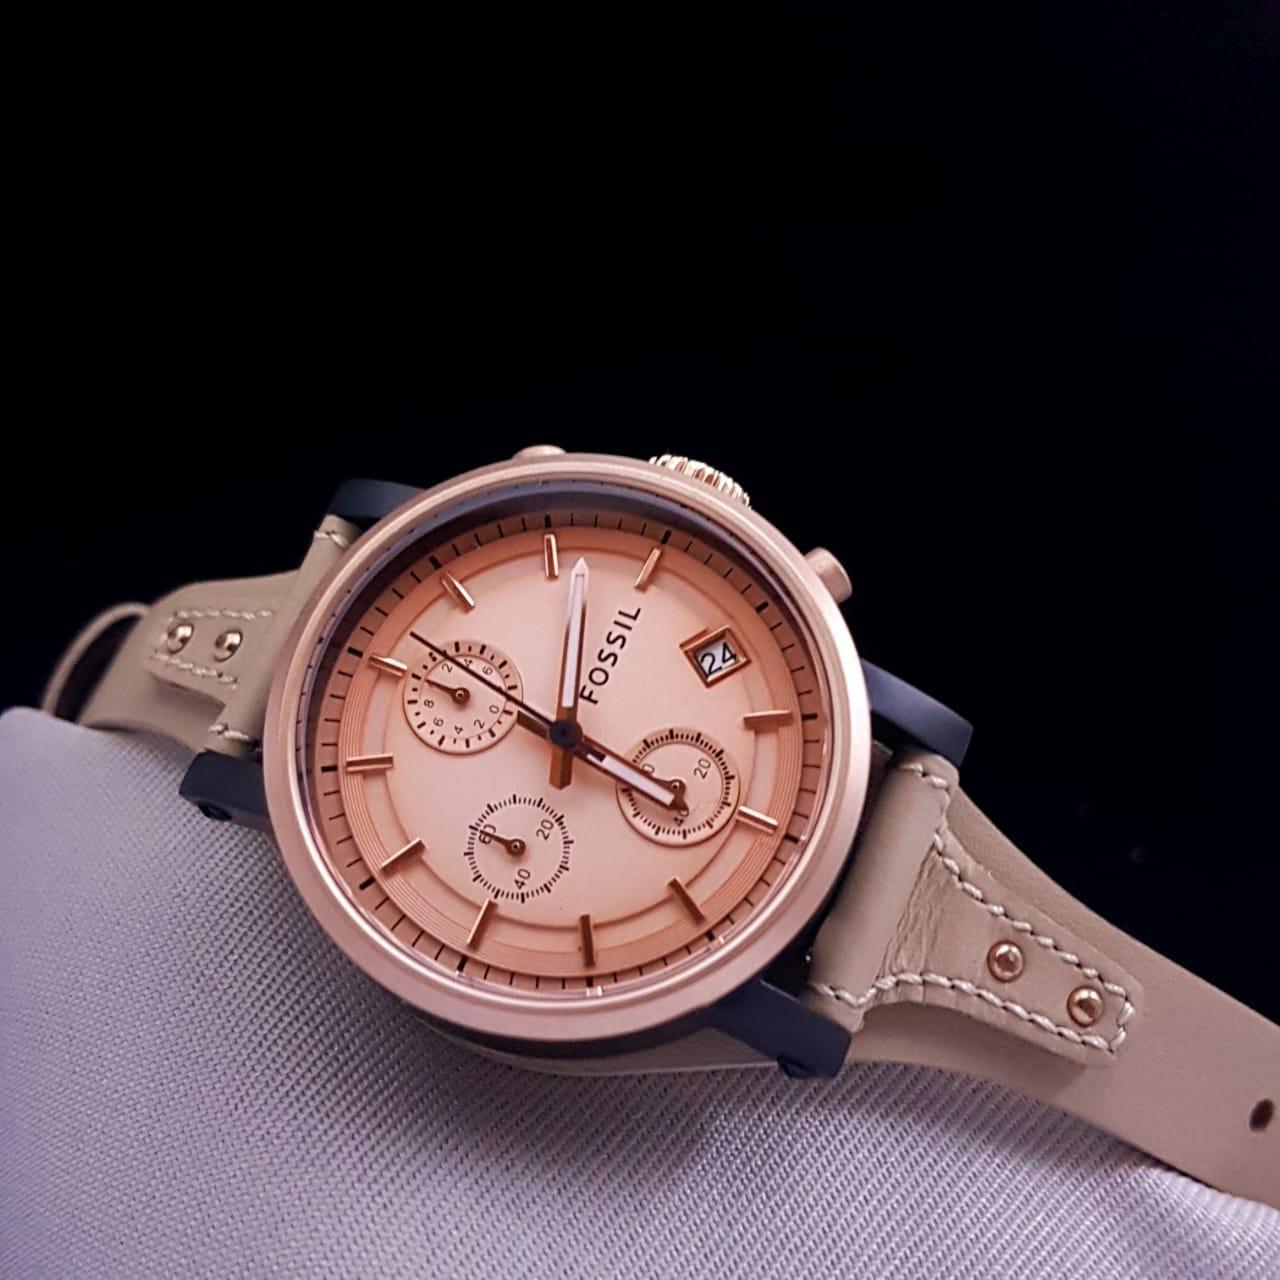 Harga Jam Tangan Fossil Bf Beige Boyfriend Original Watch Es 3811 Wanita Es3889 Riley Light Brown Merk 4113 Es4113